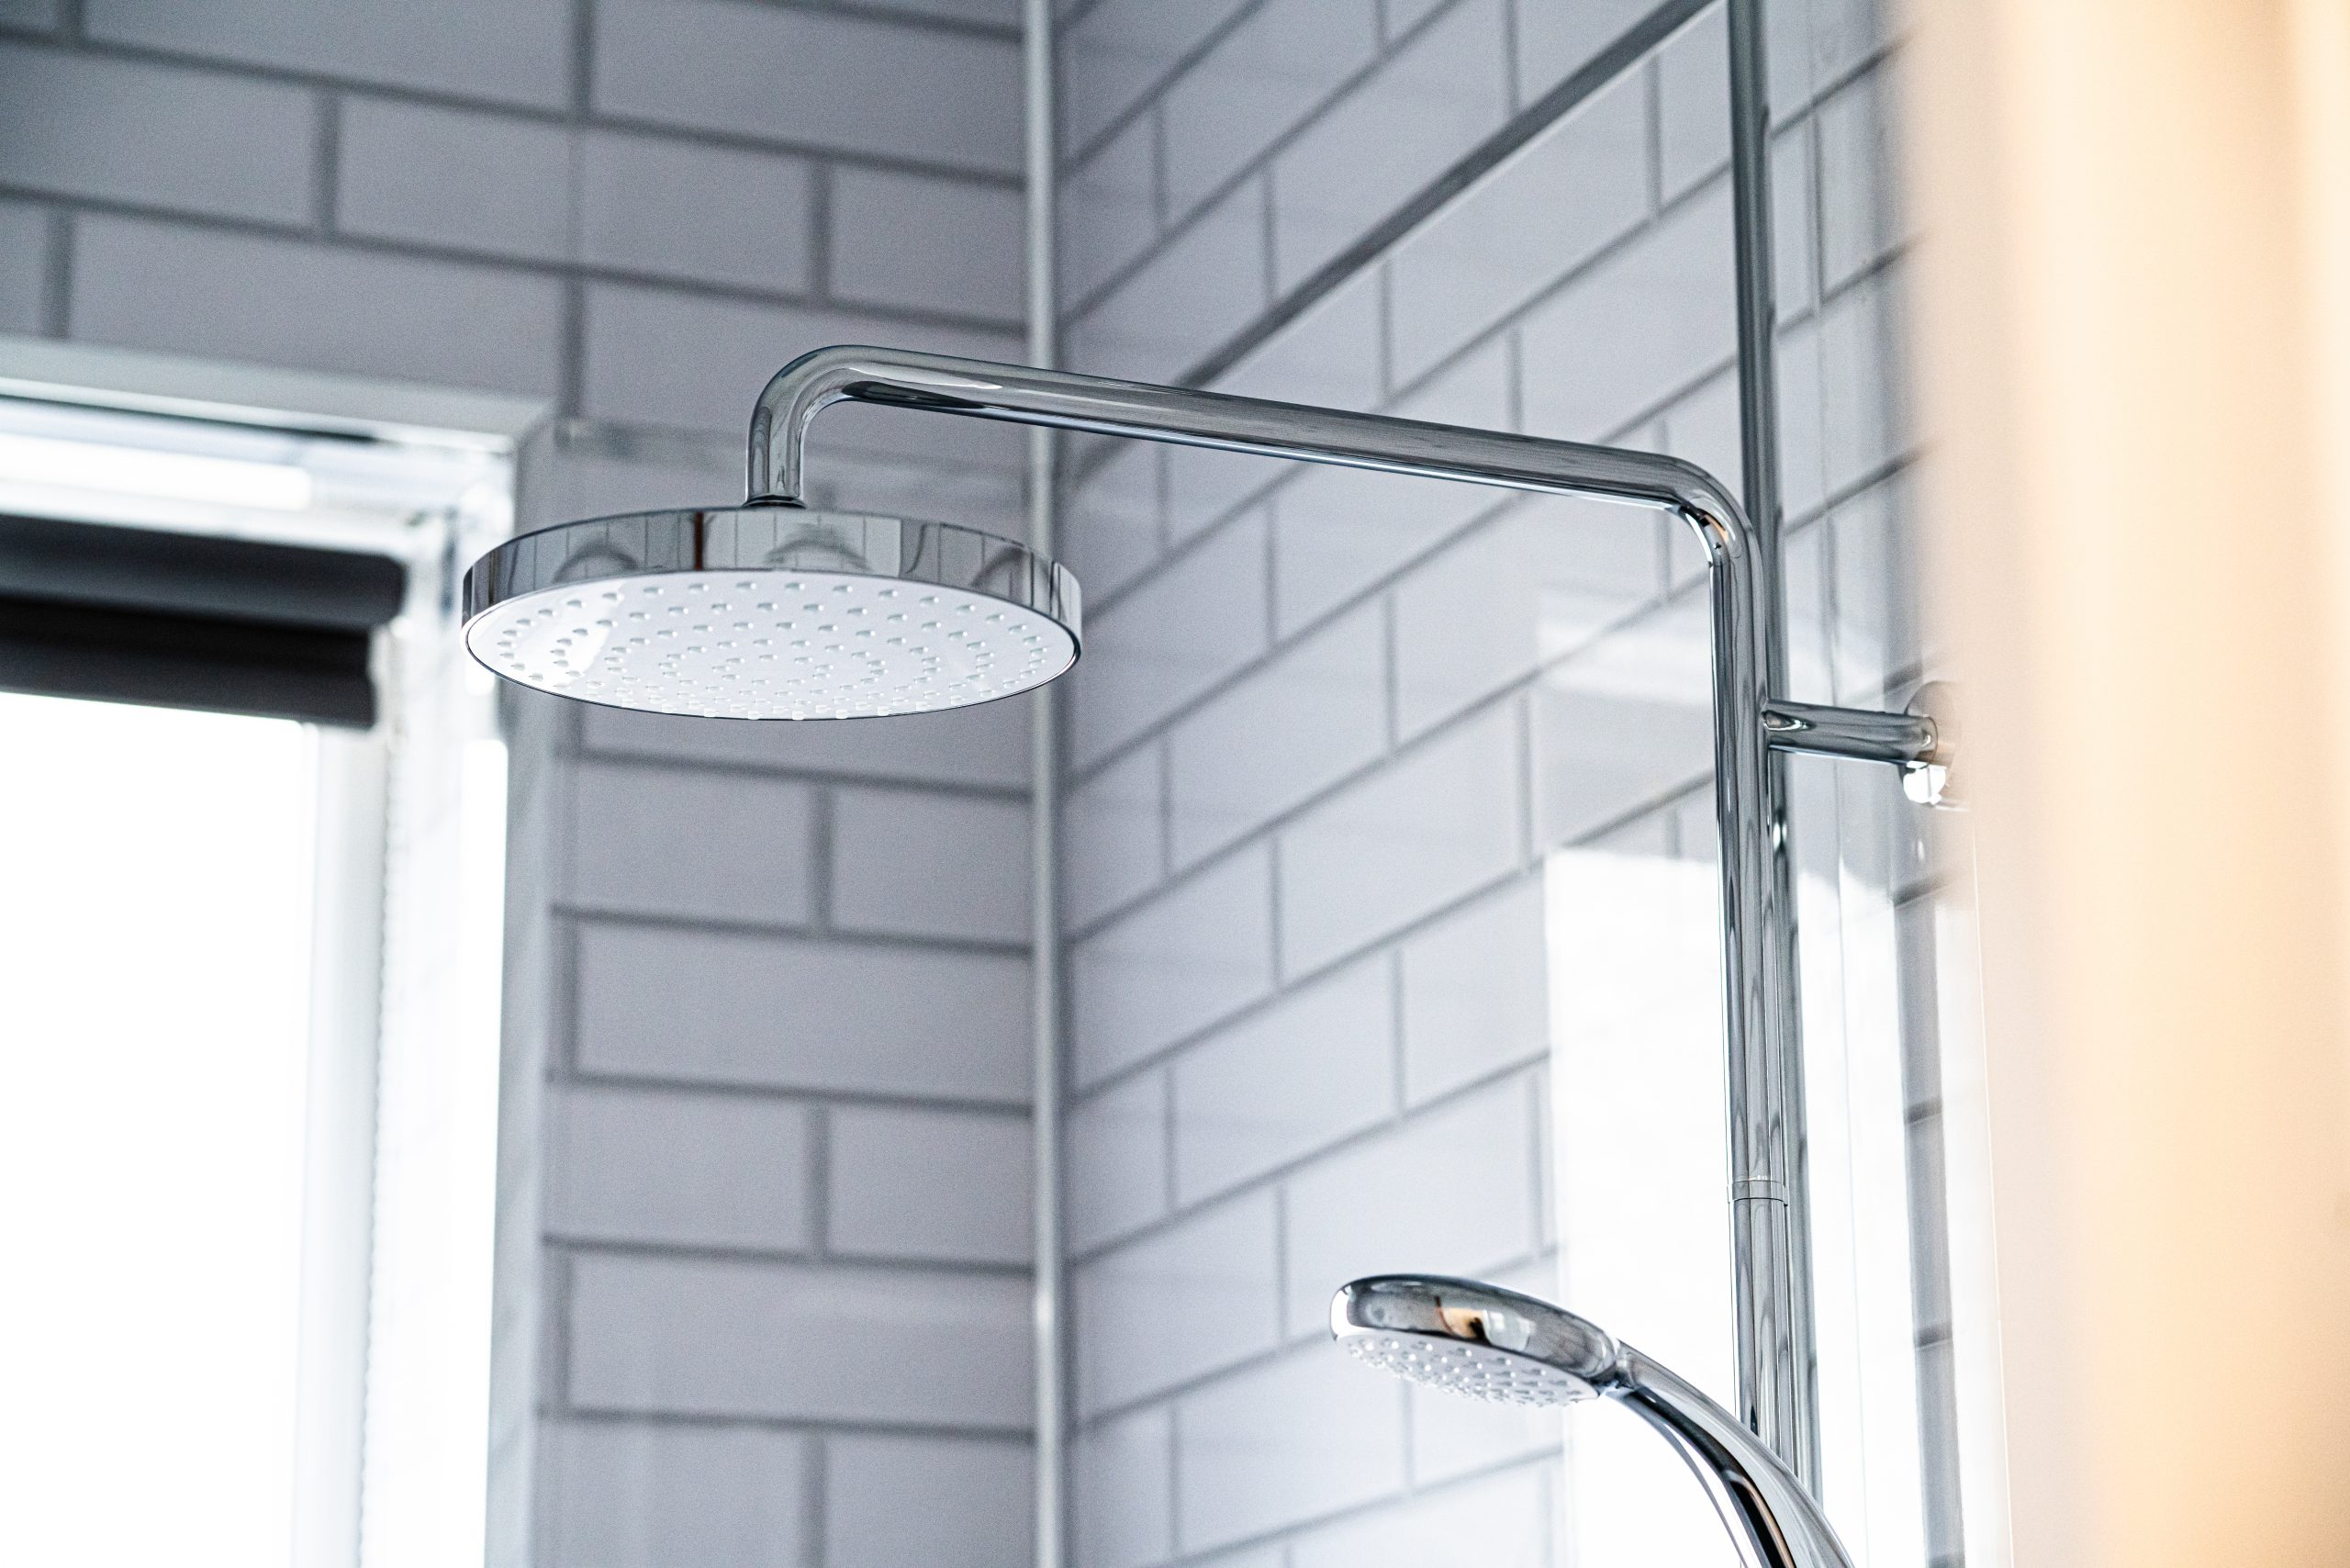 Caerau Heights shower head